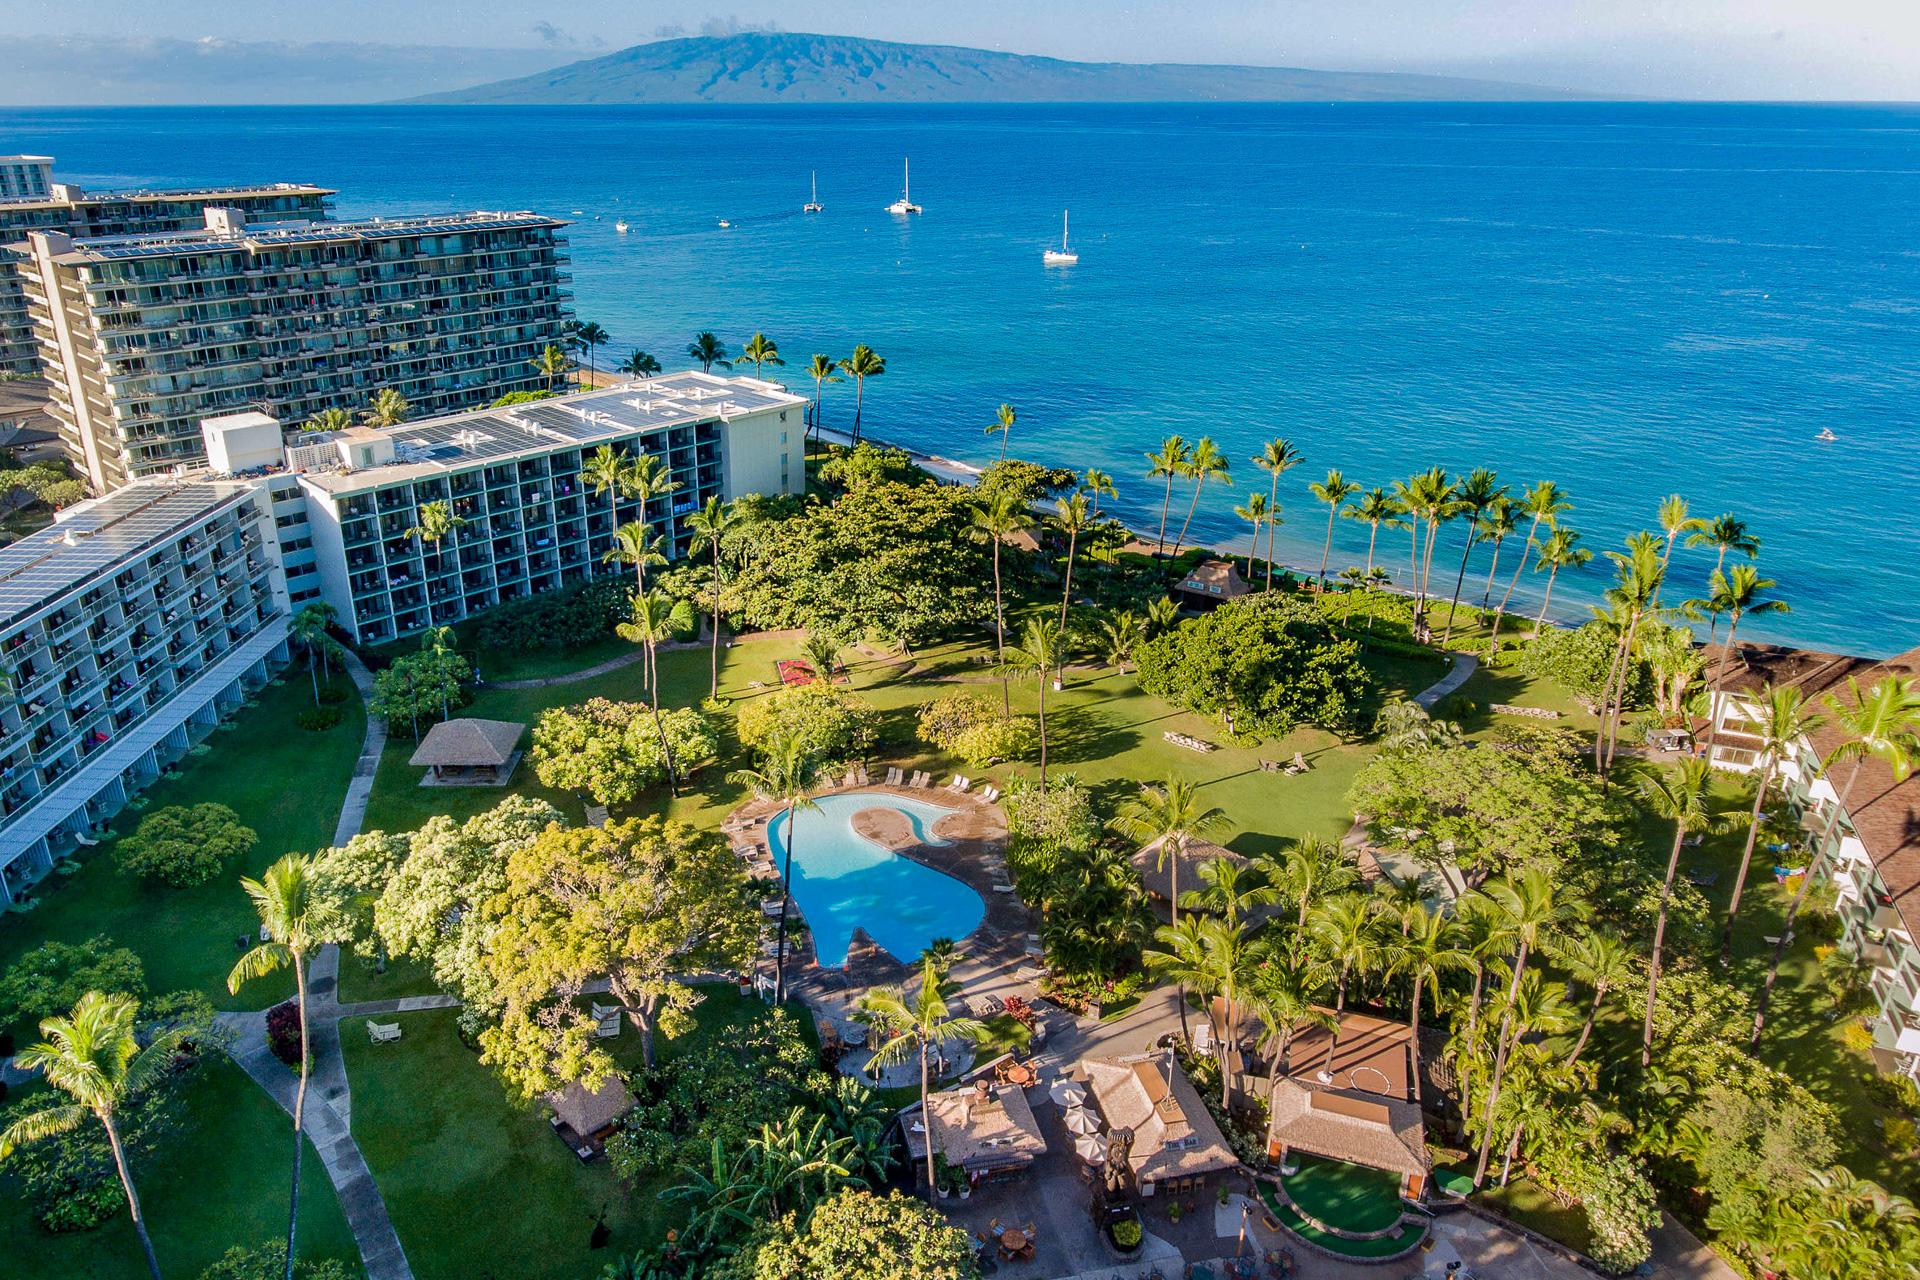 Aerial view of Ka'anapali Beach Hotel; TripAdvisor Expert Photo